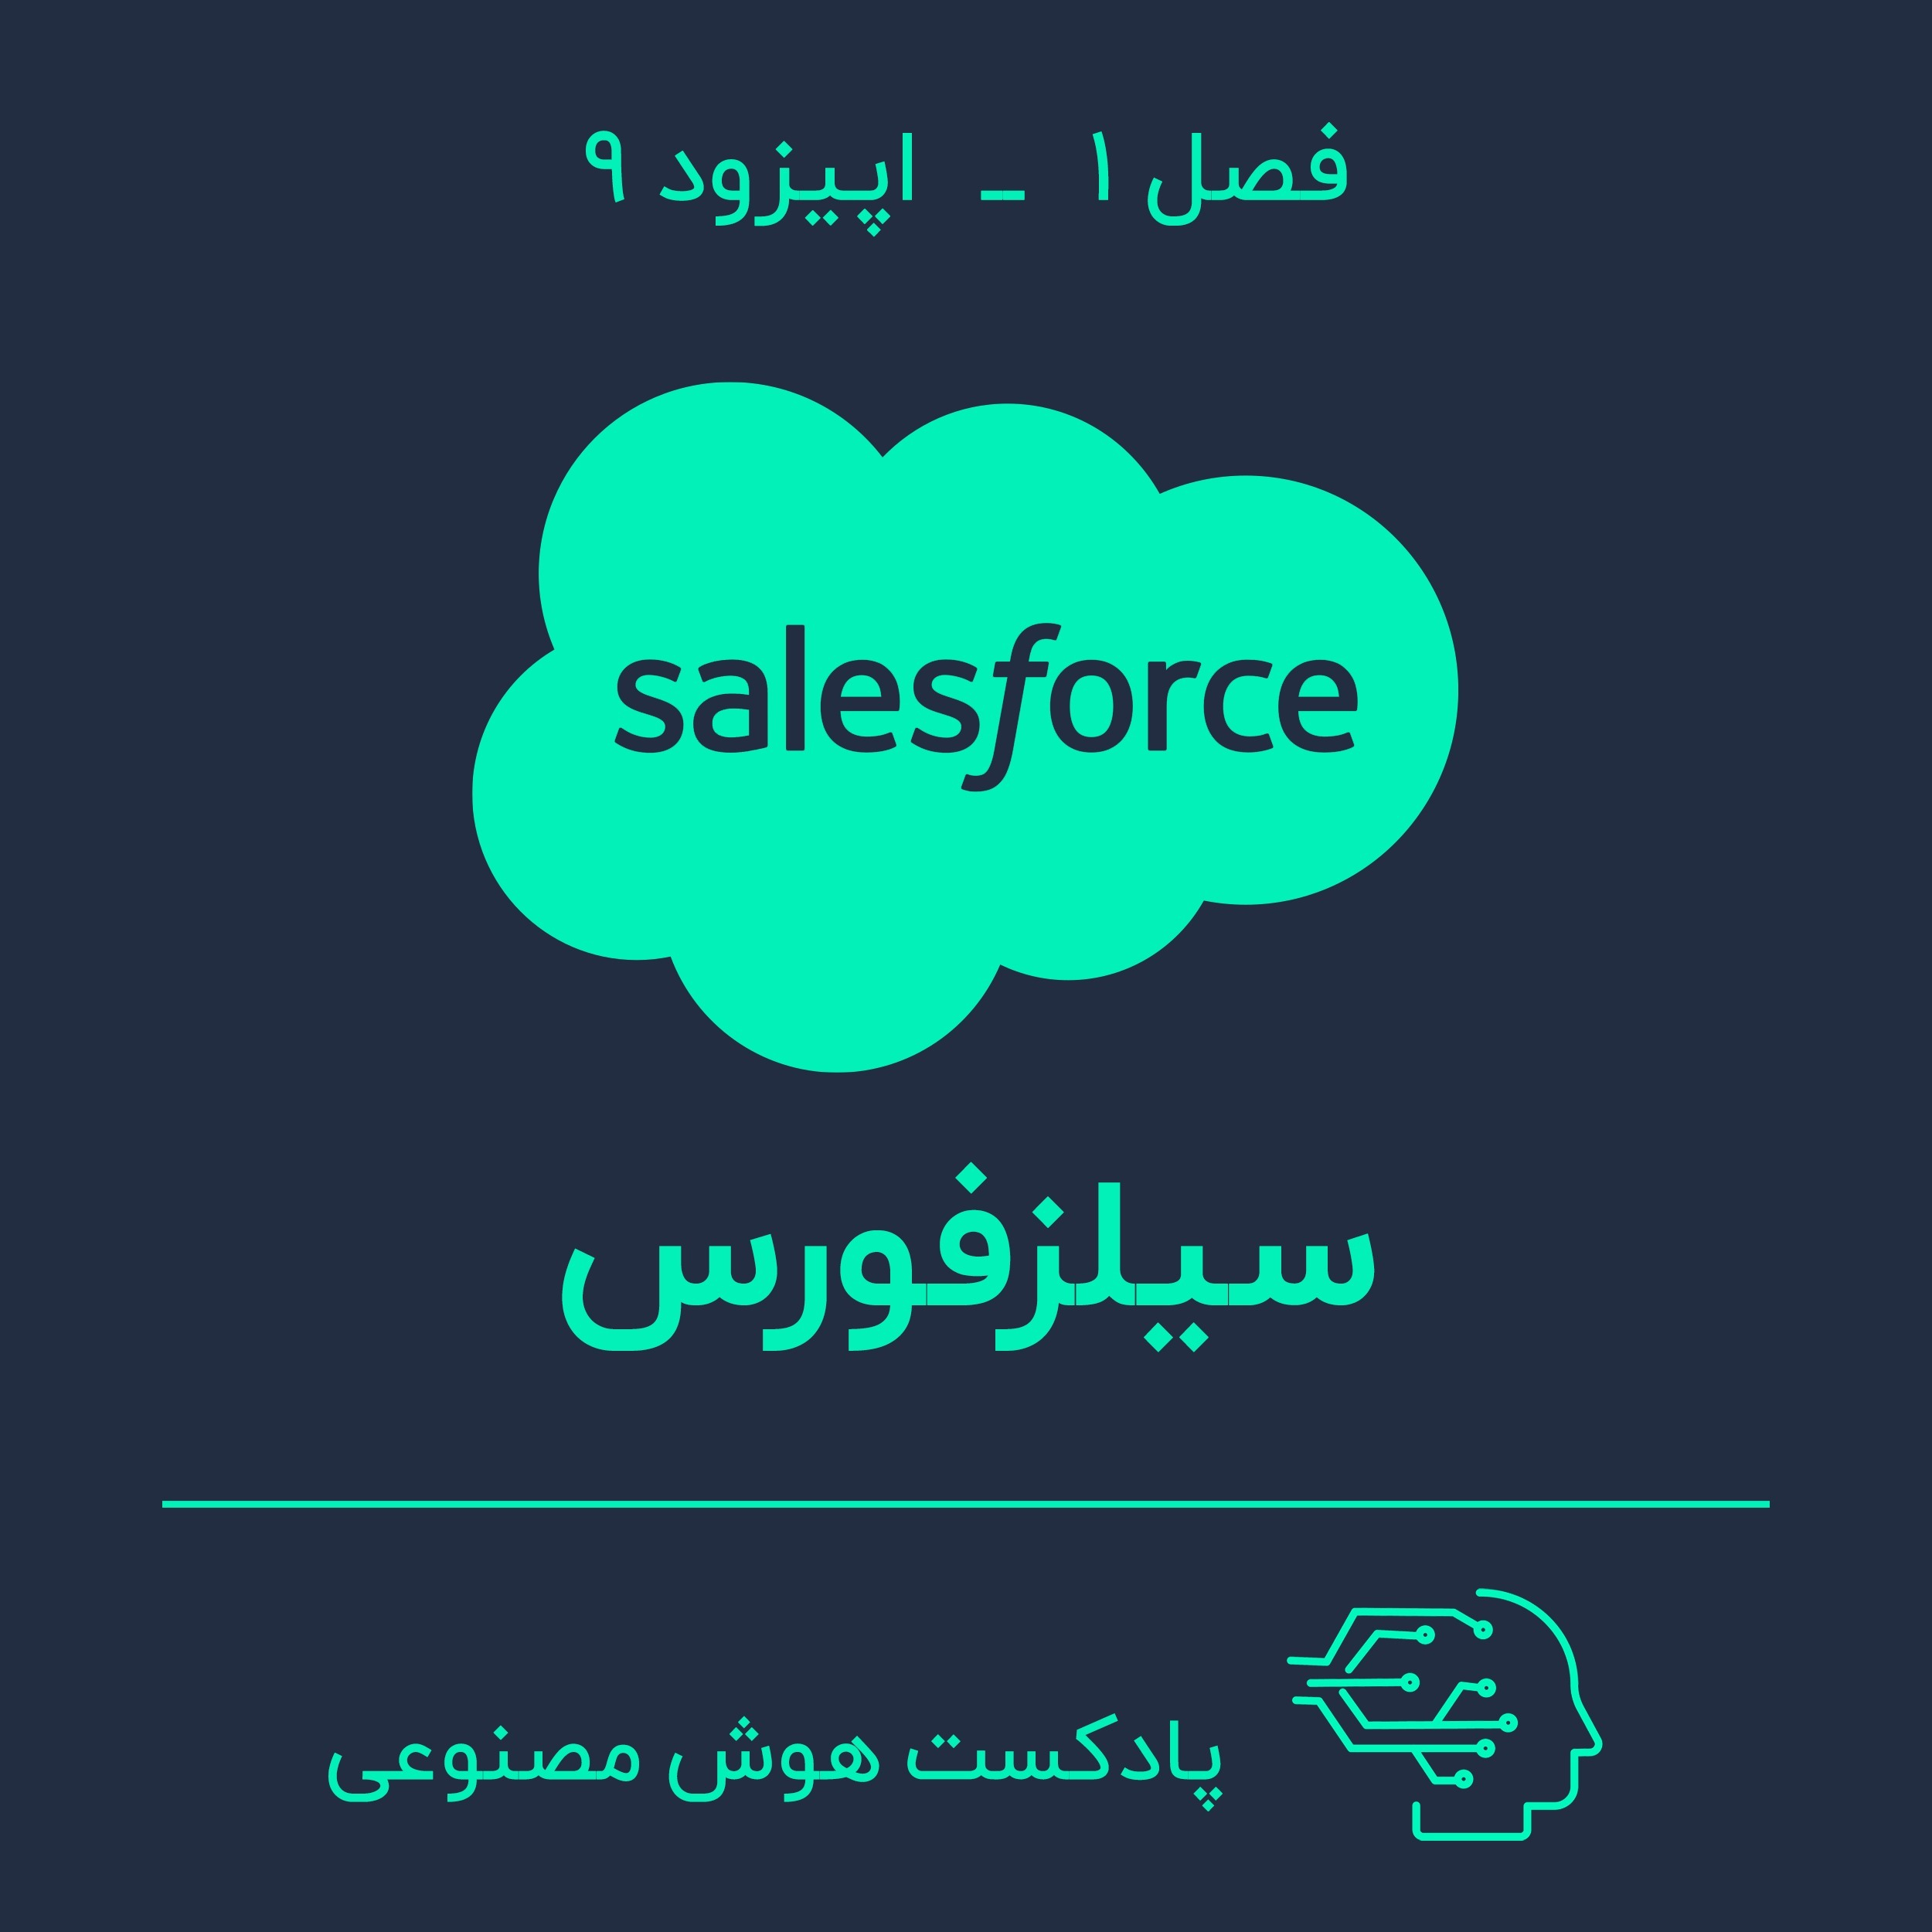 (Salesforce) هوش مصنوعی در کسب و کار — بخش نهم: سیلزفورس